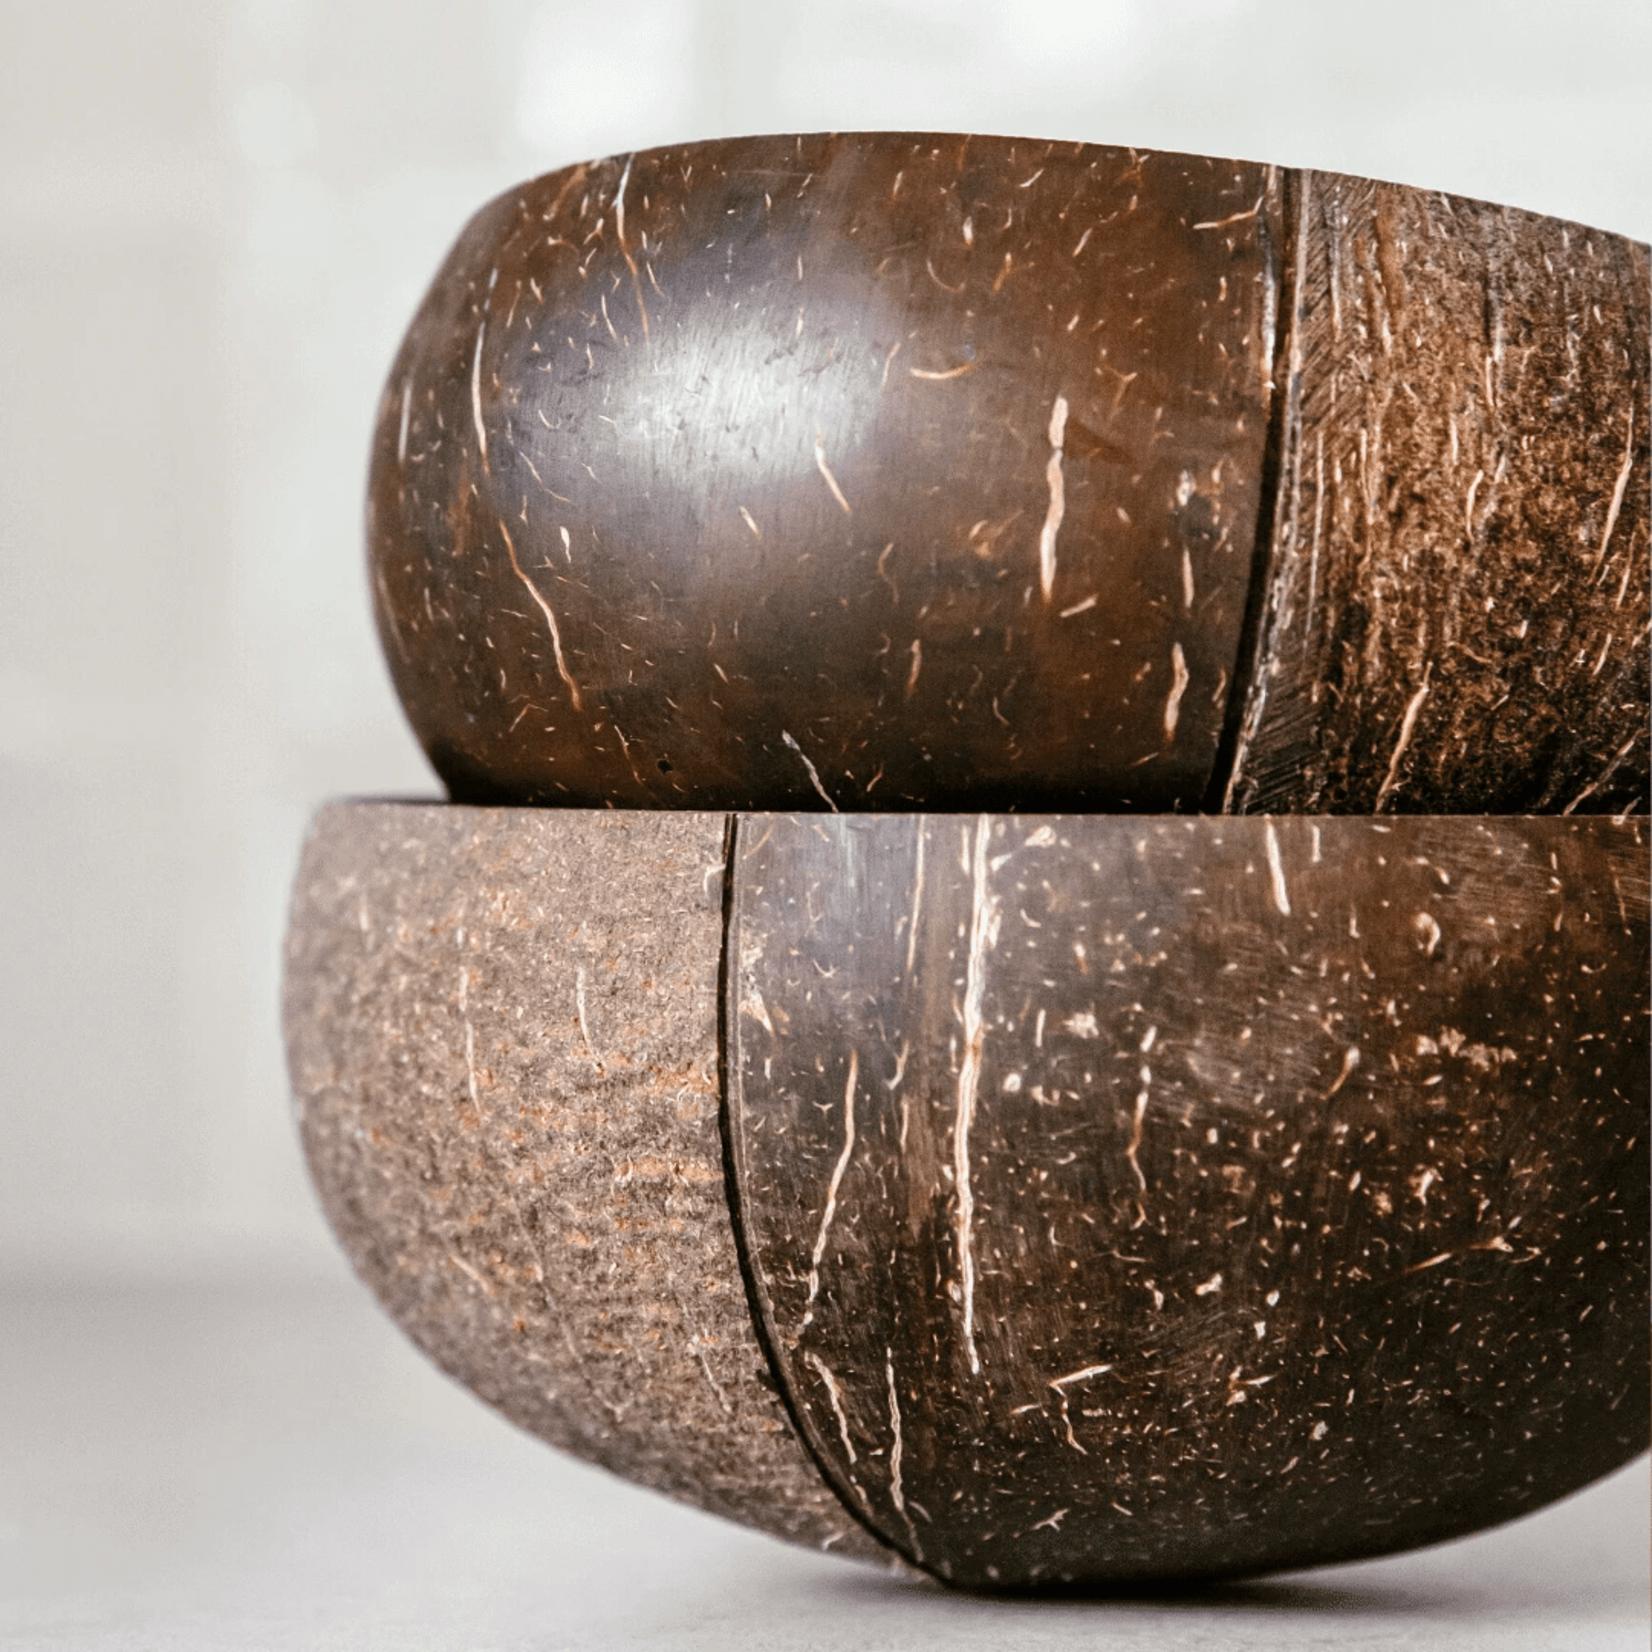 COCONUT BOWLS Yin + Yang Boho Coconut Bowl